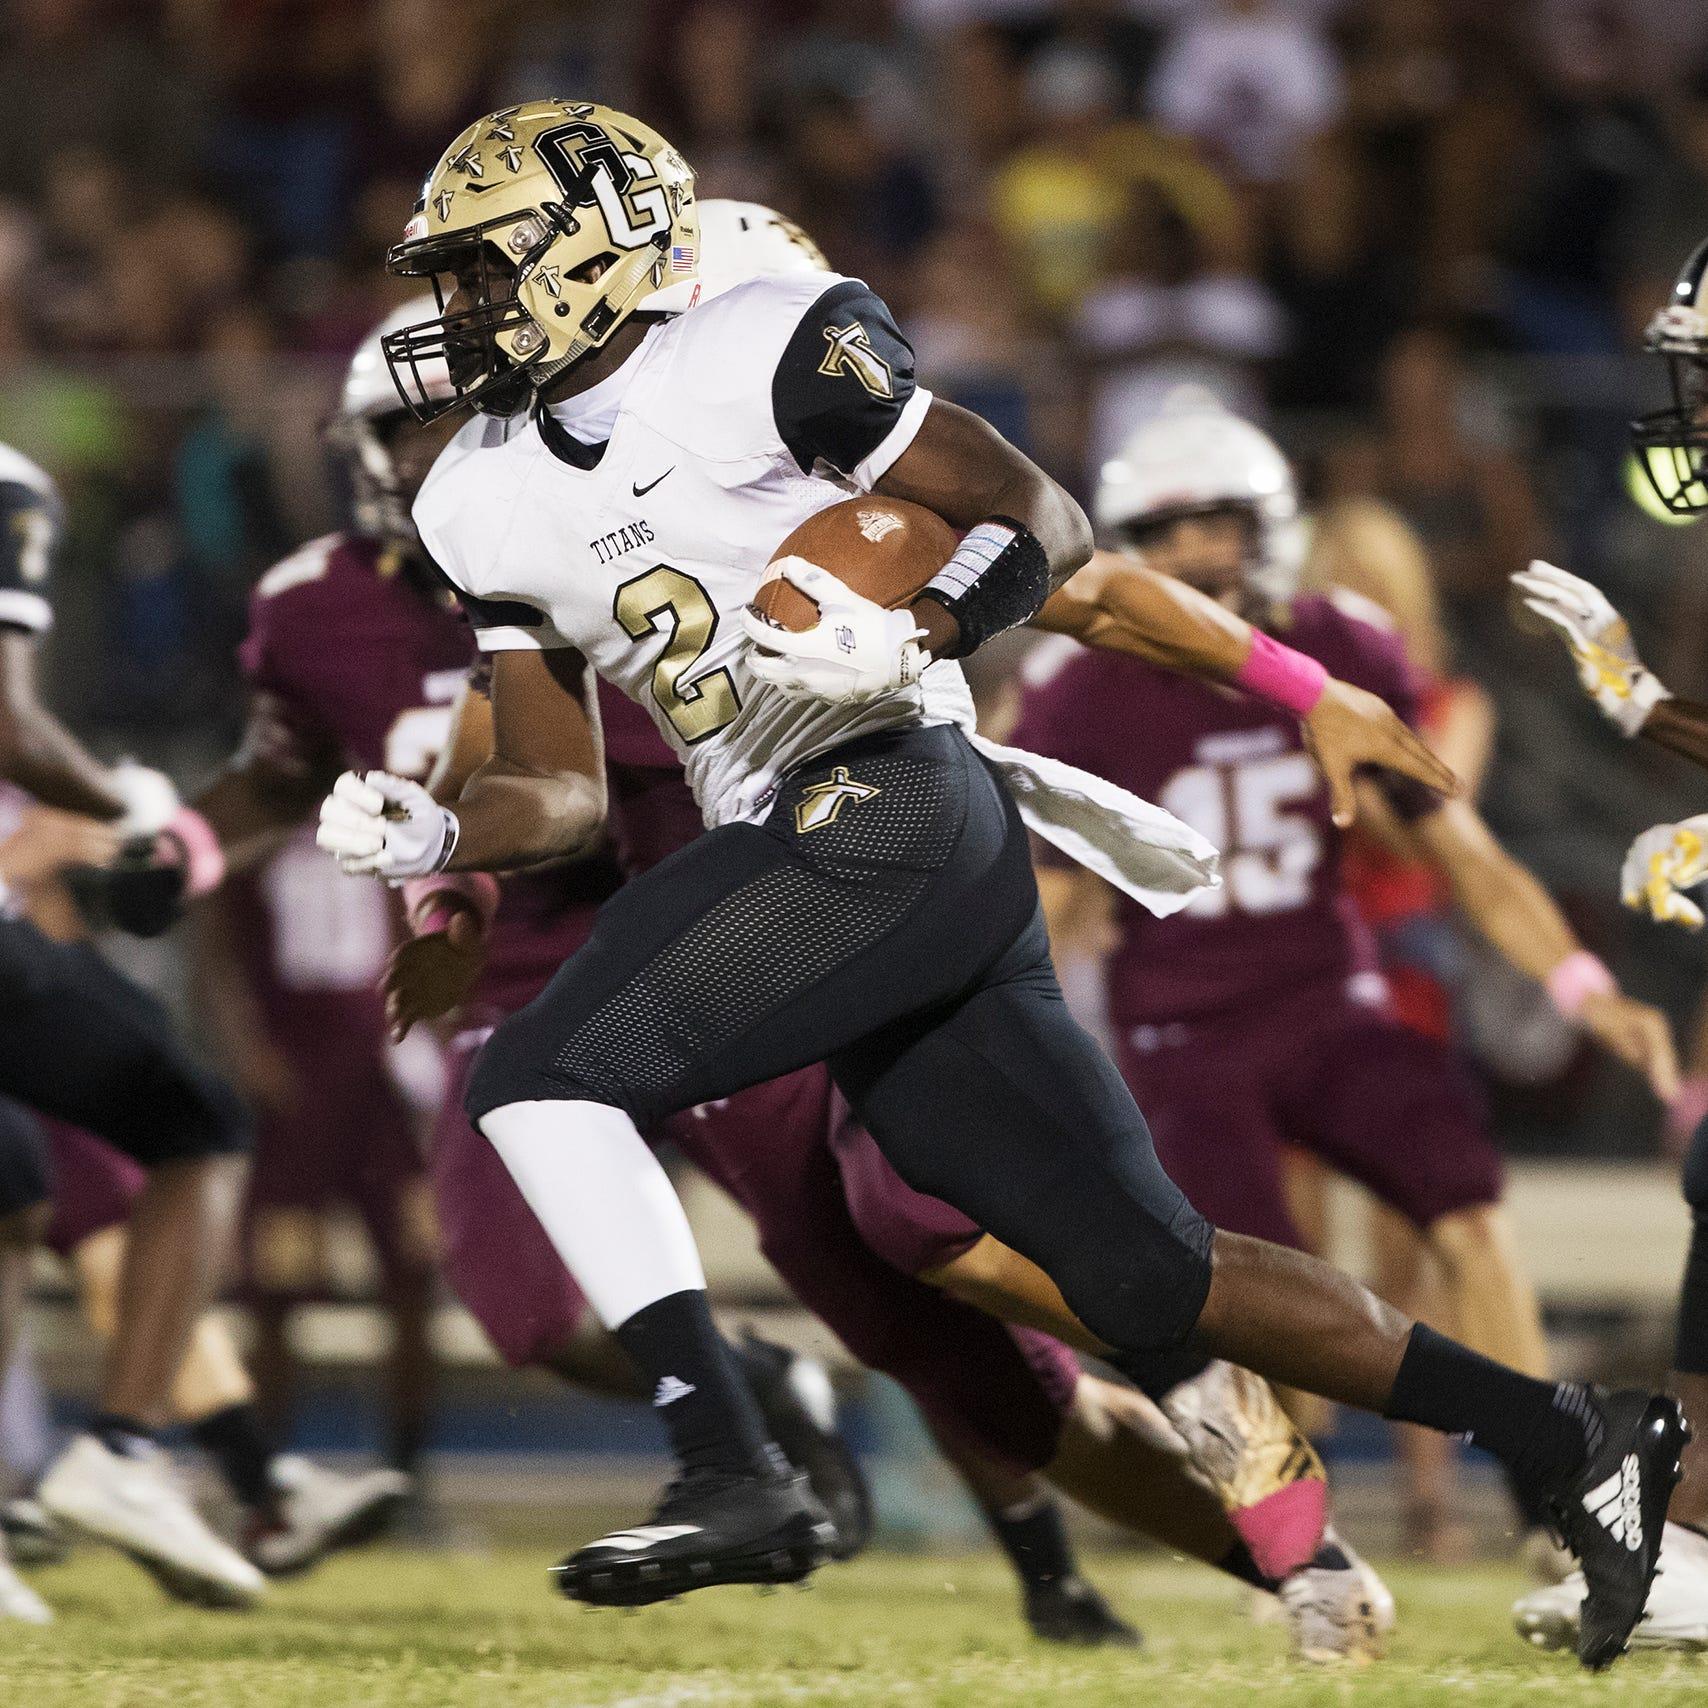 SWFL High School football: Scores, photos, videos for Week 9 of the regular season